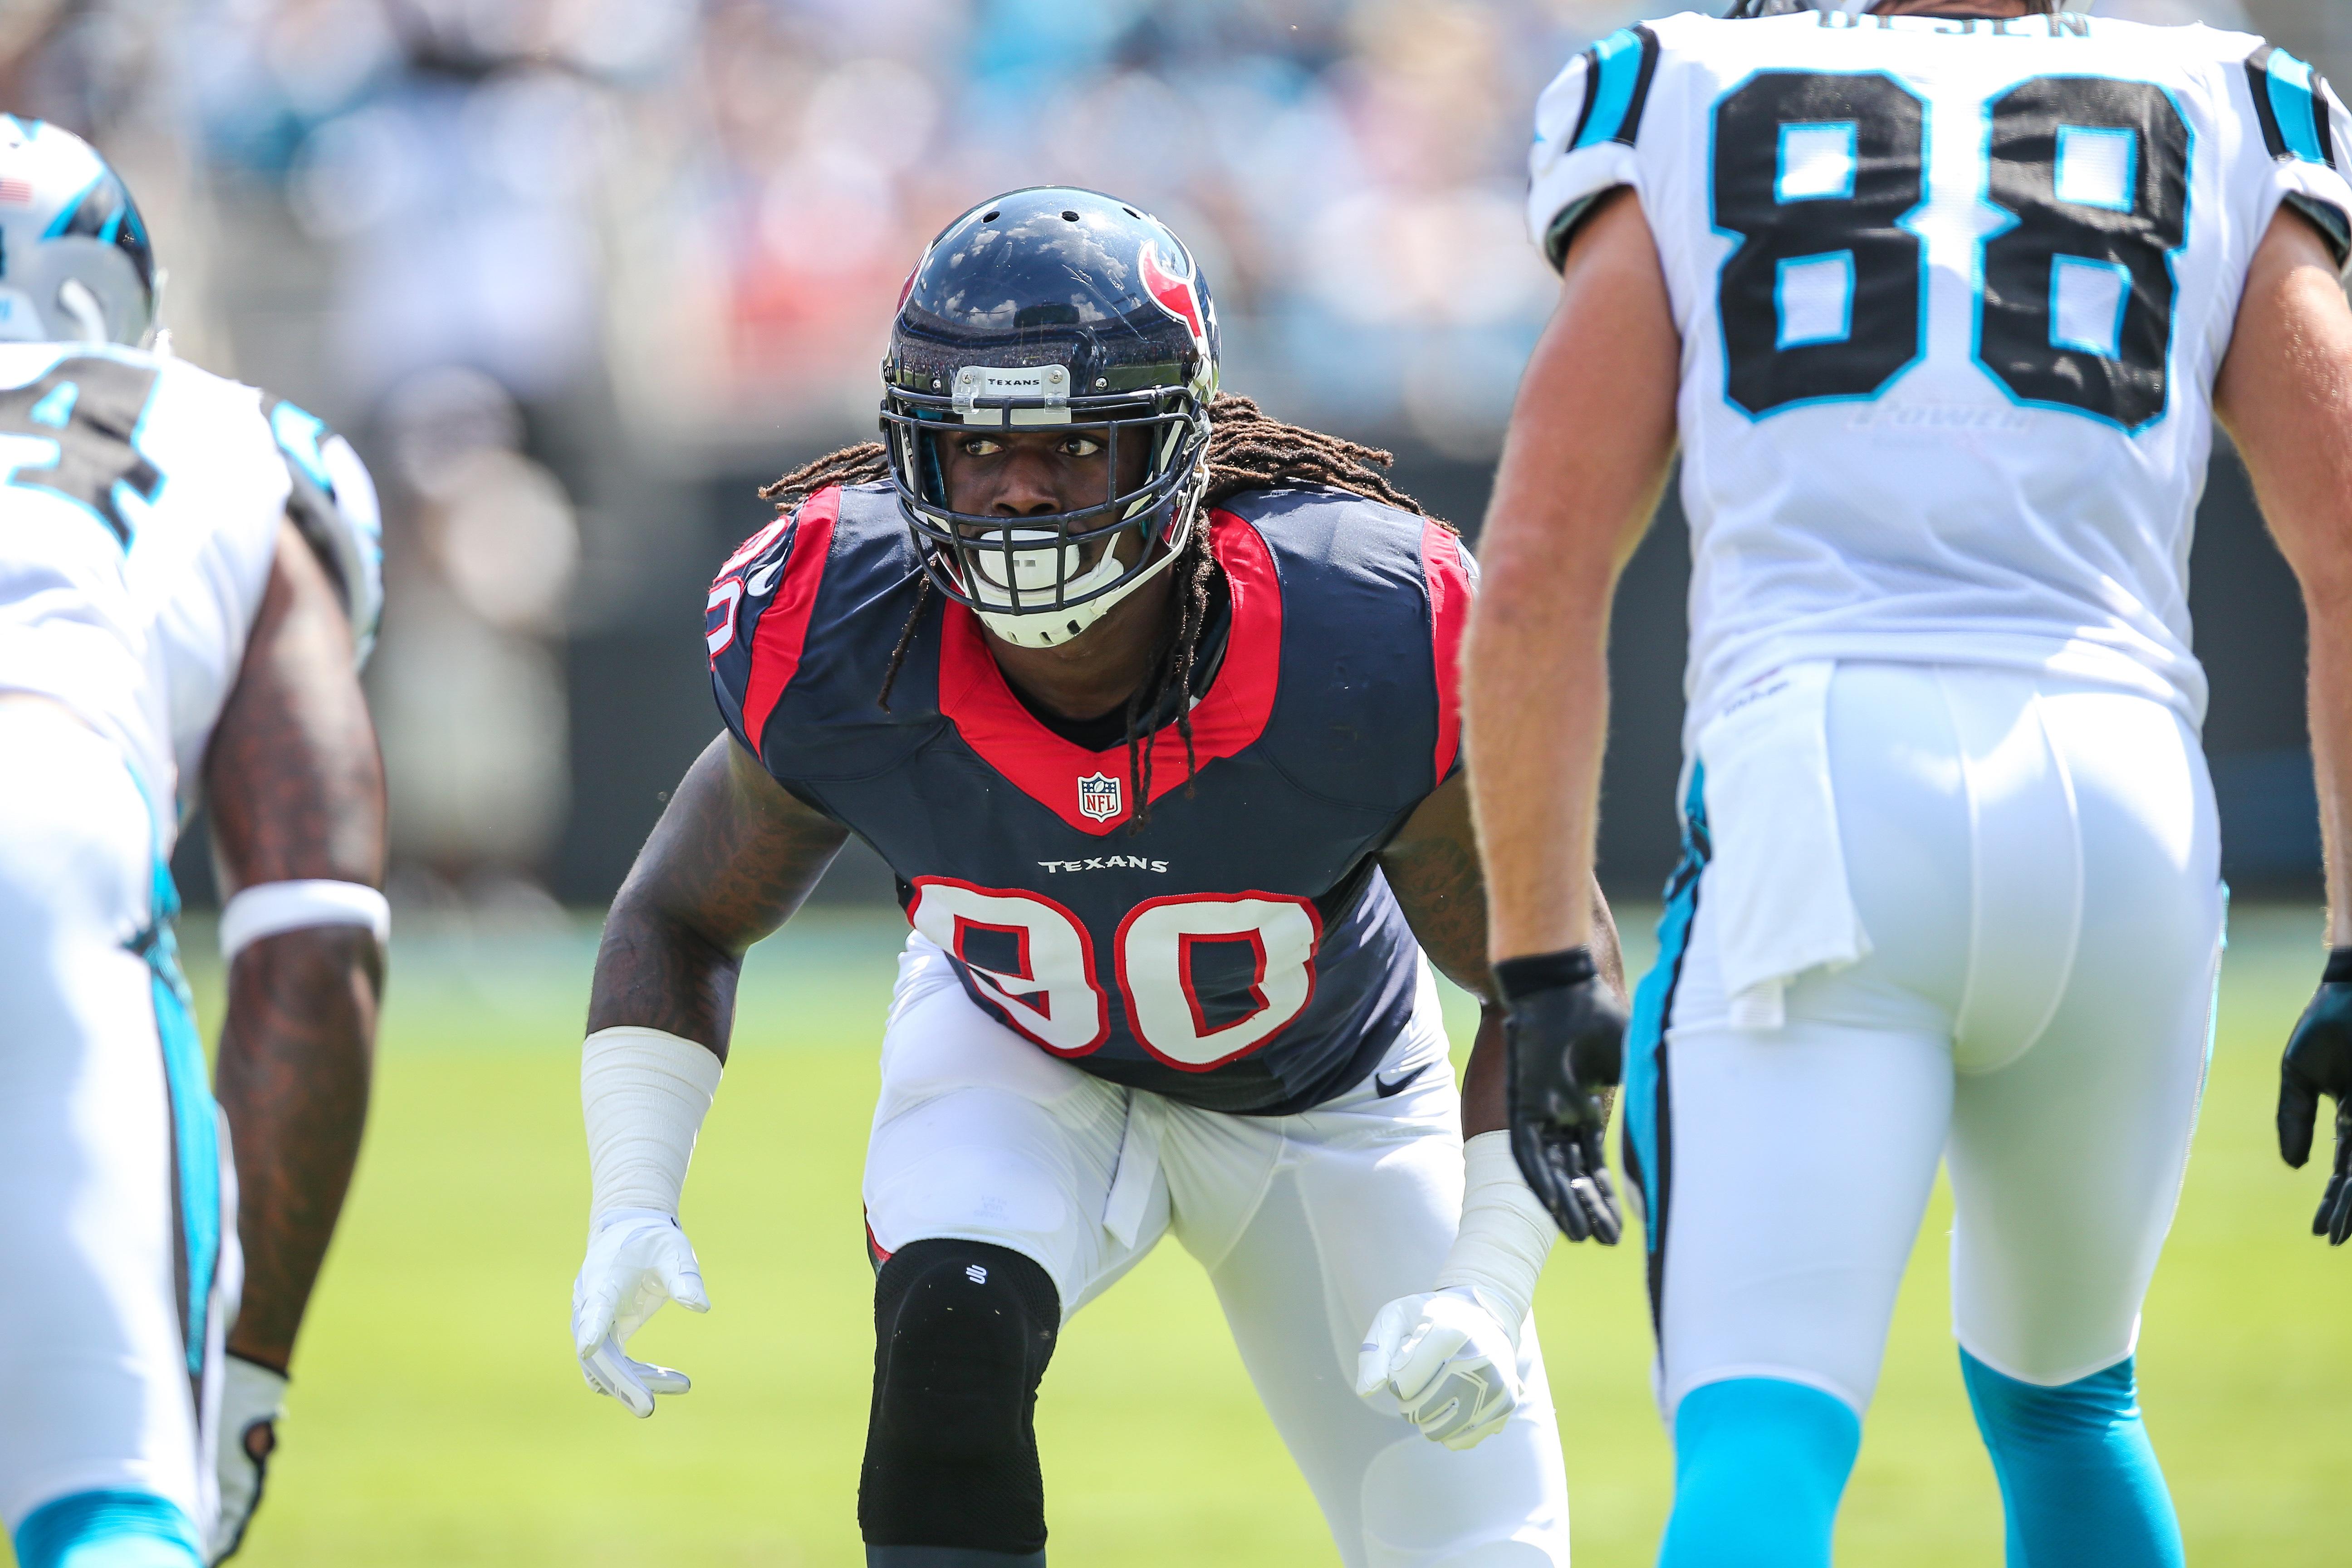 NFL: SEP 20 Texans at Panthers